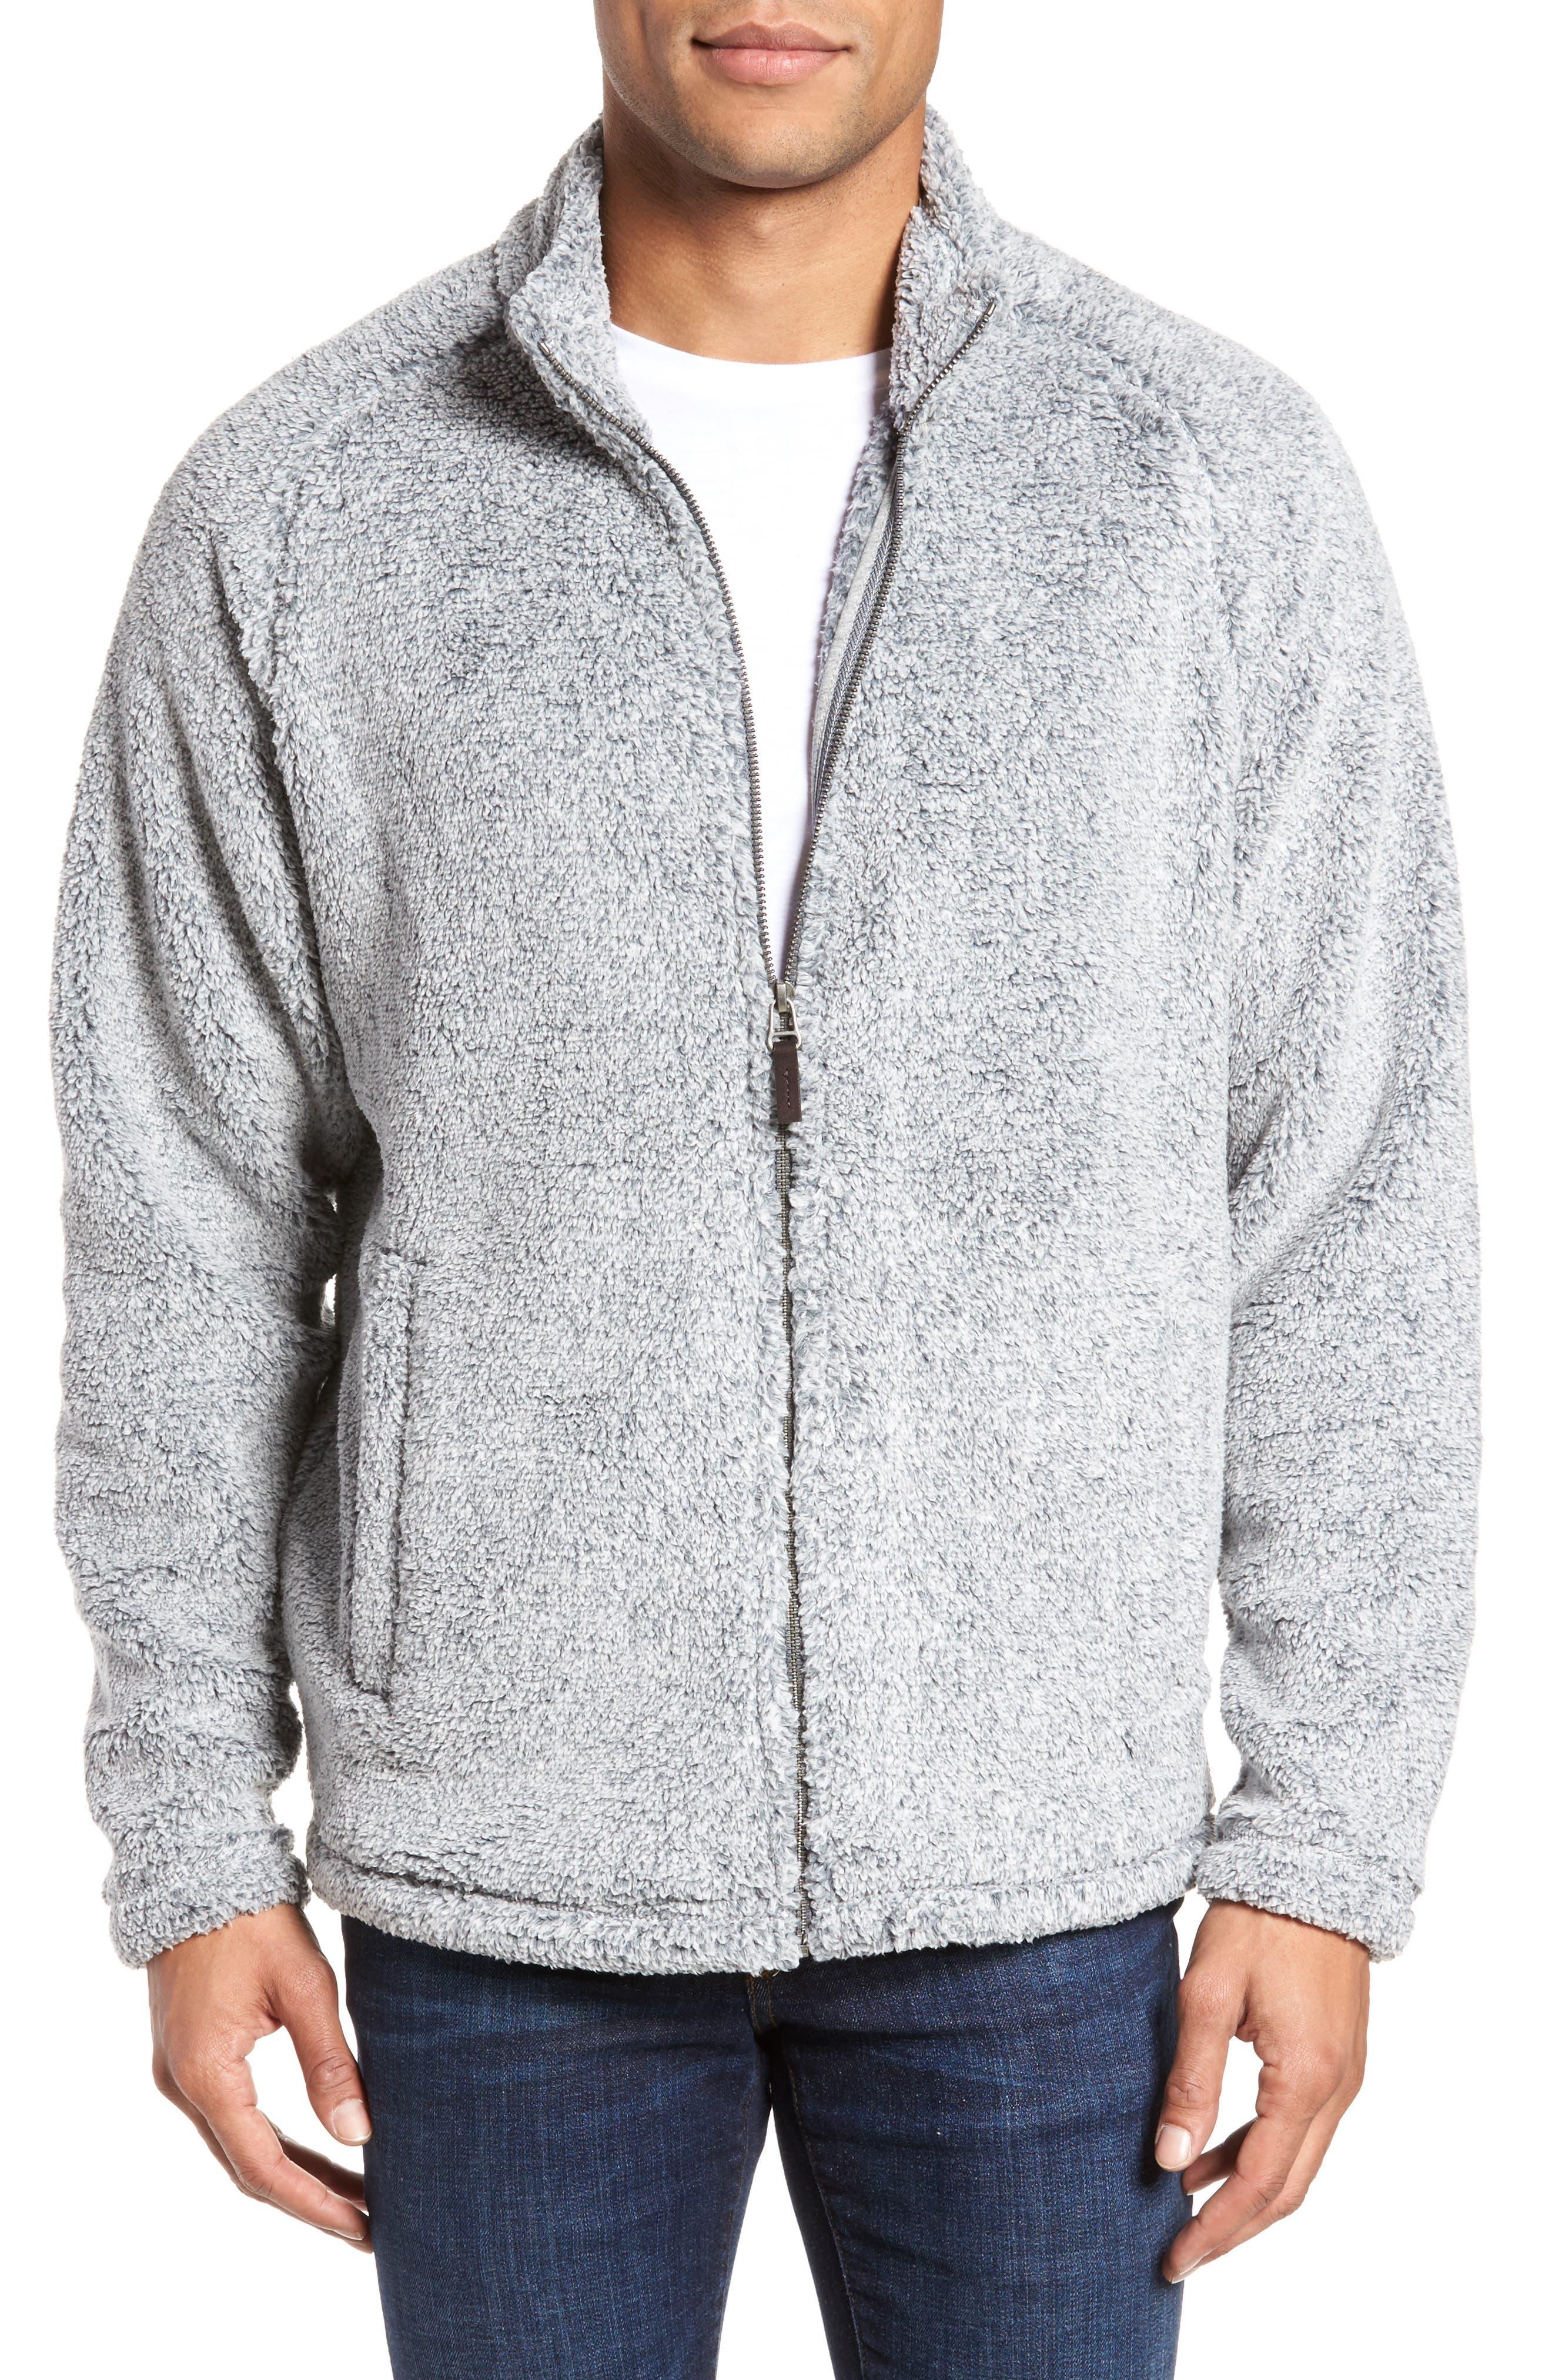 Nordstrom Men's Shop Polar Fleece Jacket